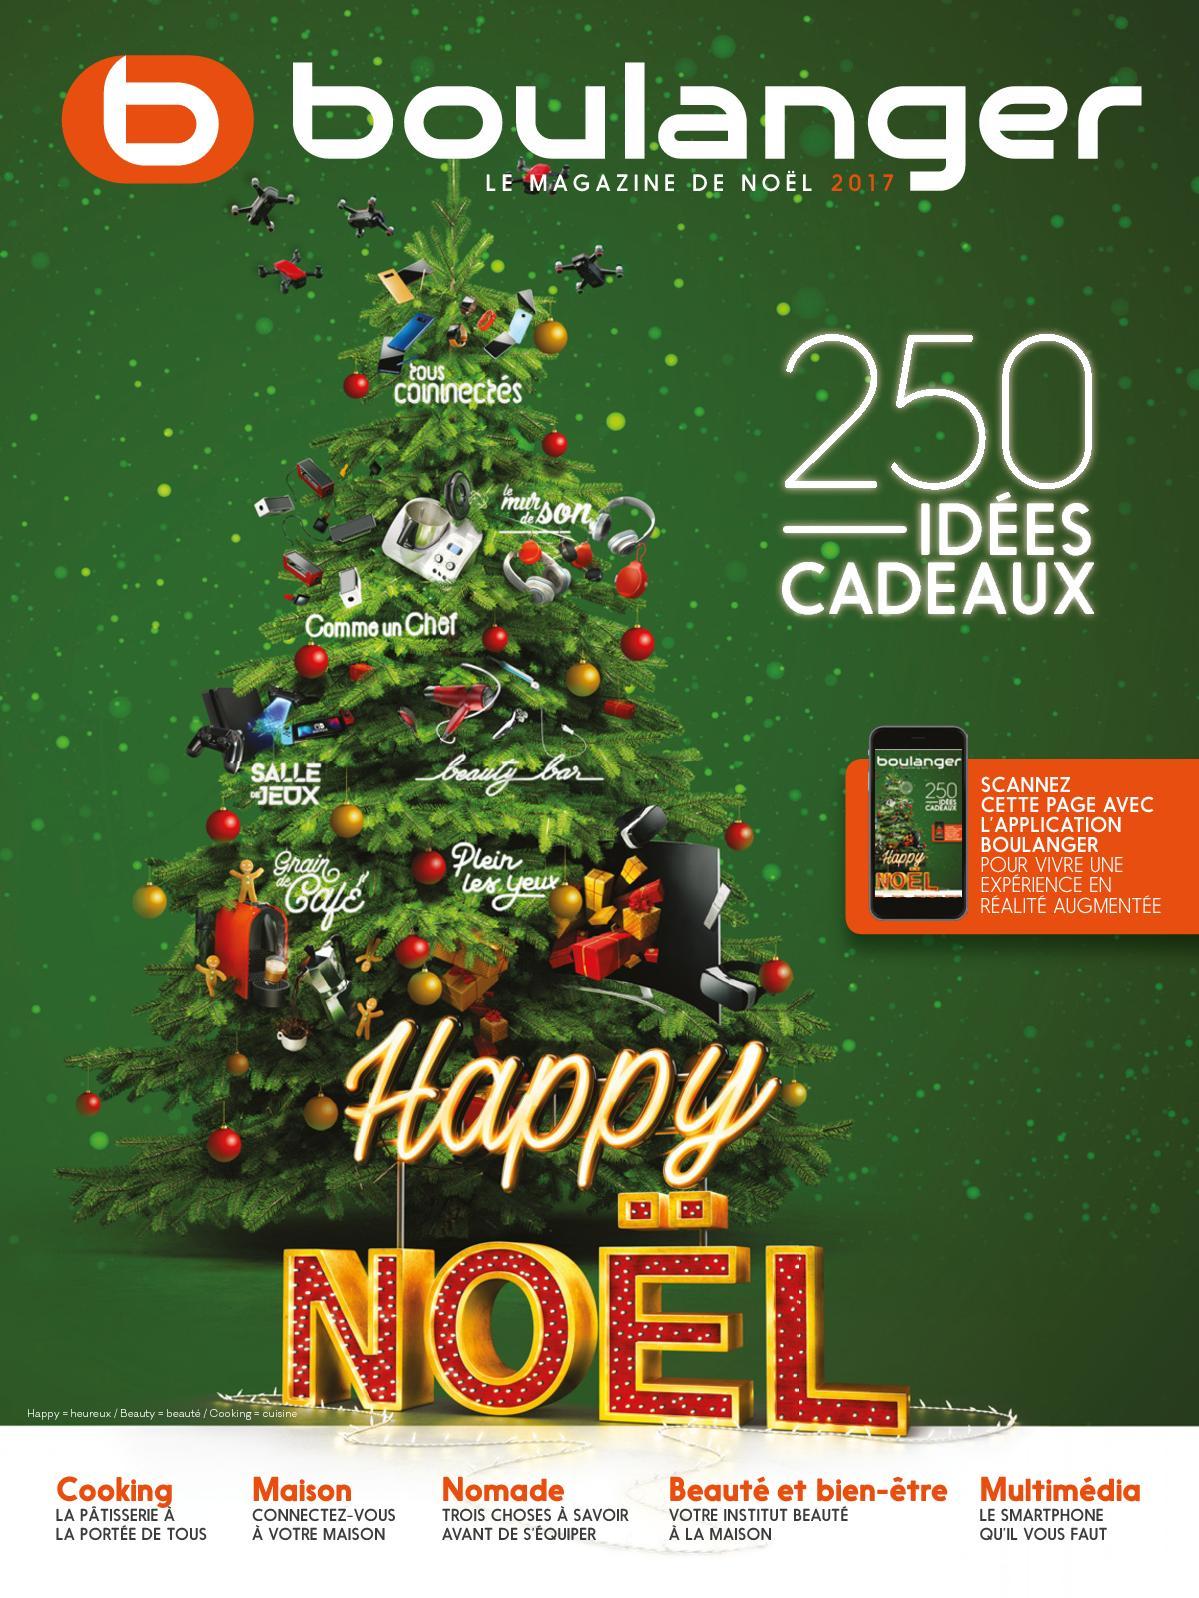 catalogue noel 2018 boulanger Calaméo   Boulanger Catalogue Noel catalogue noel 2018 boulanger